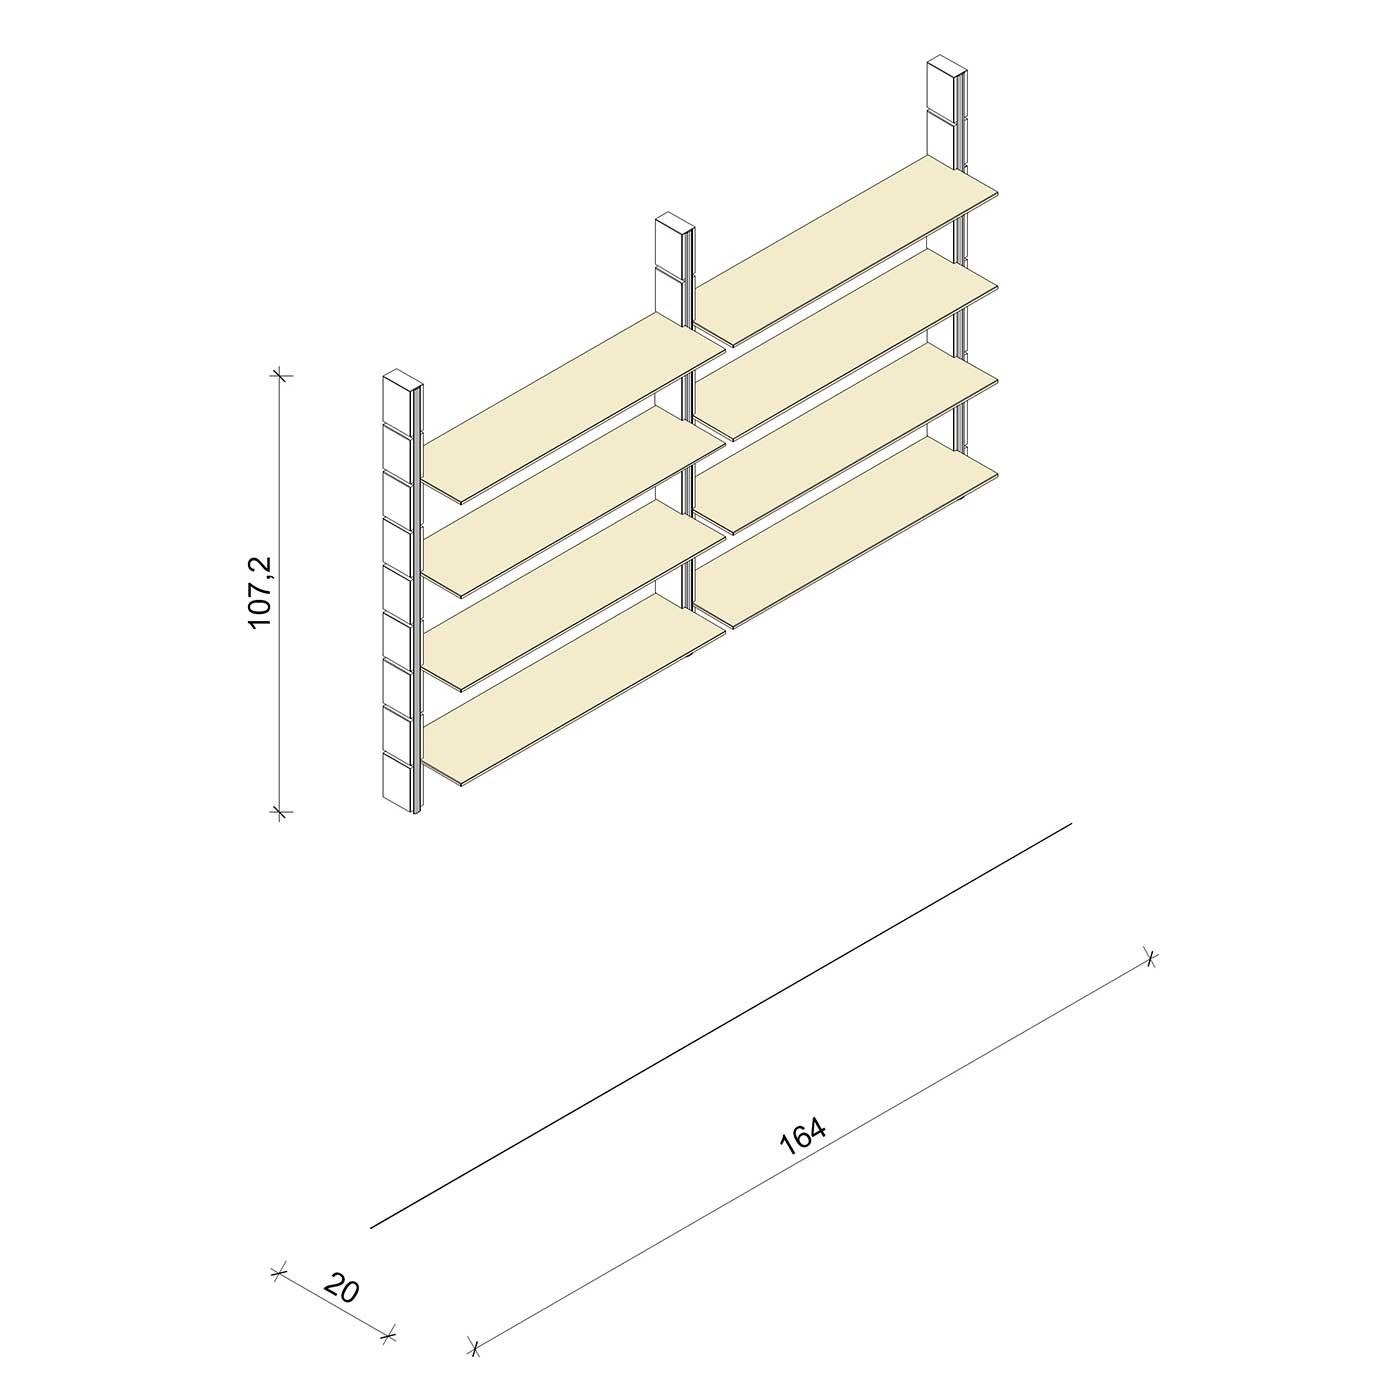 Bücherregal - Classic (M) 164 - Maß: 164 x 107,2 x 20 cm (B x H x T)